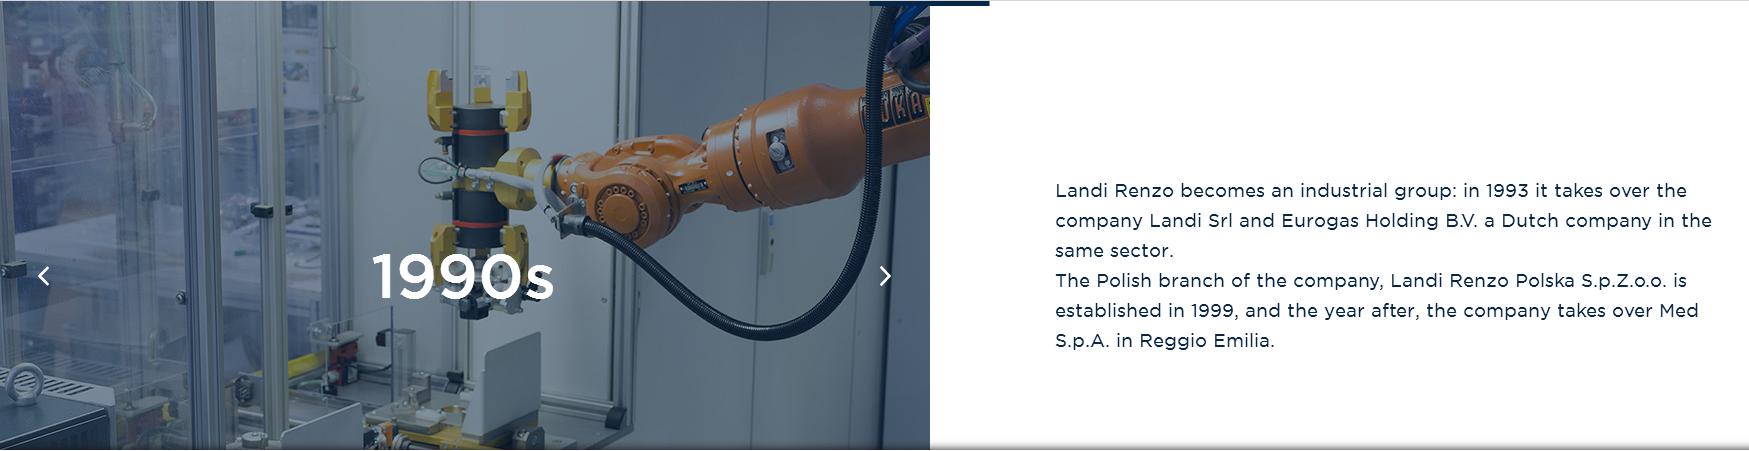 DEFUS-Car Injector-lpg Fuel Injector Introduction-3